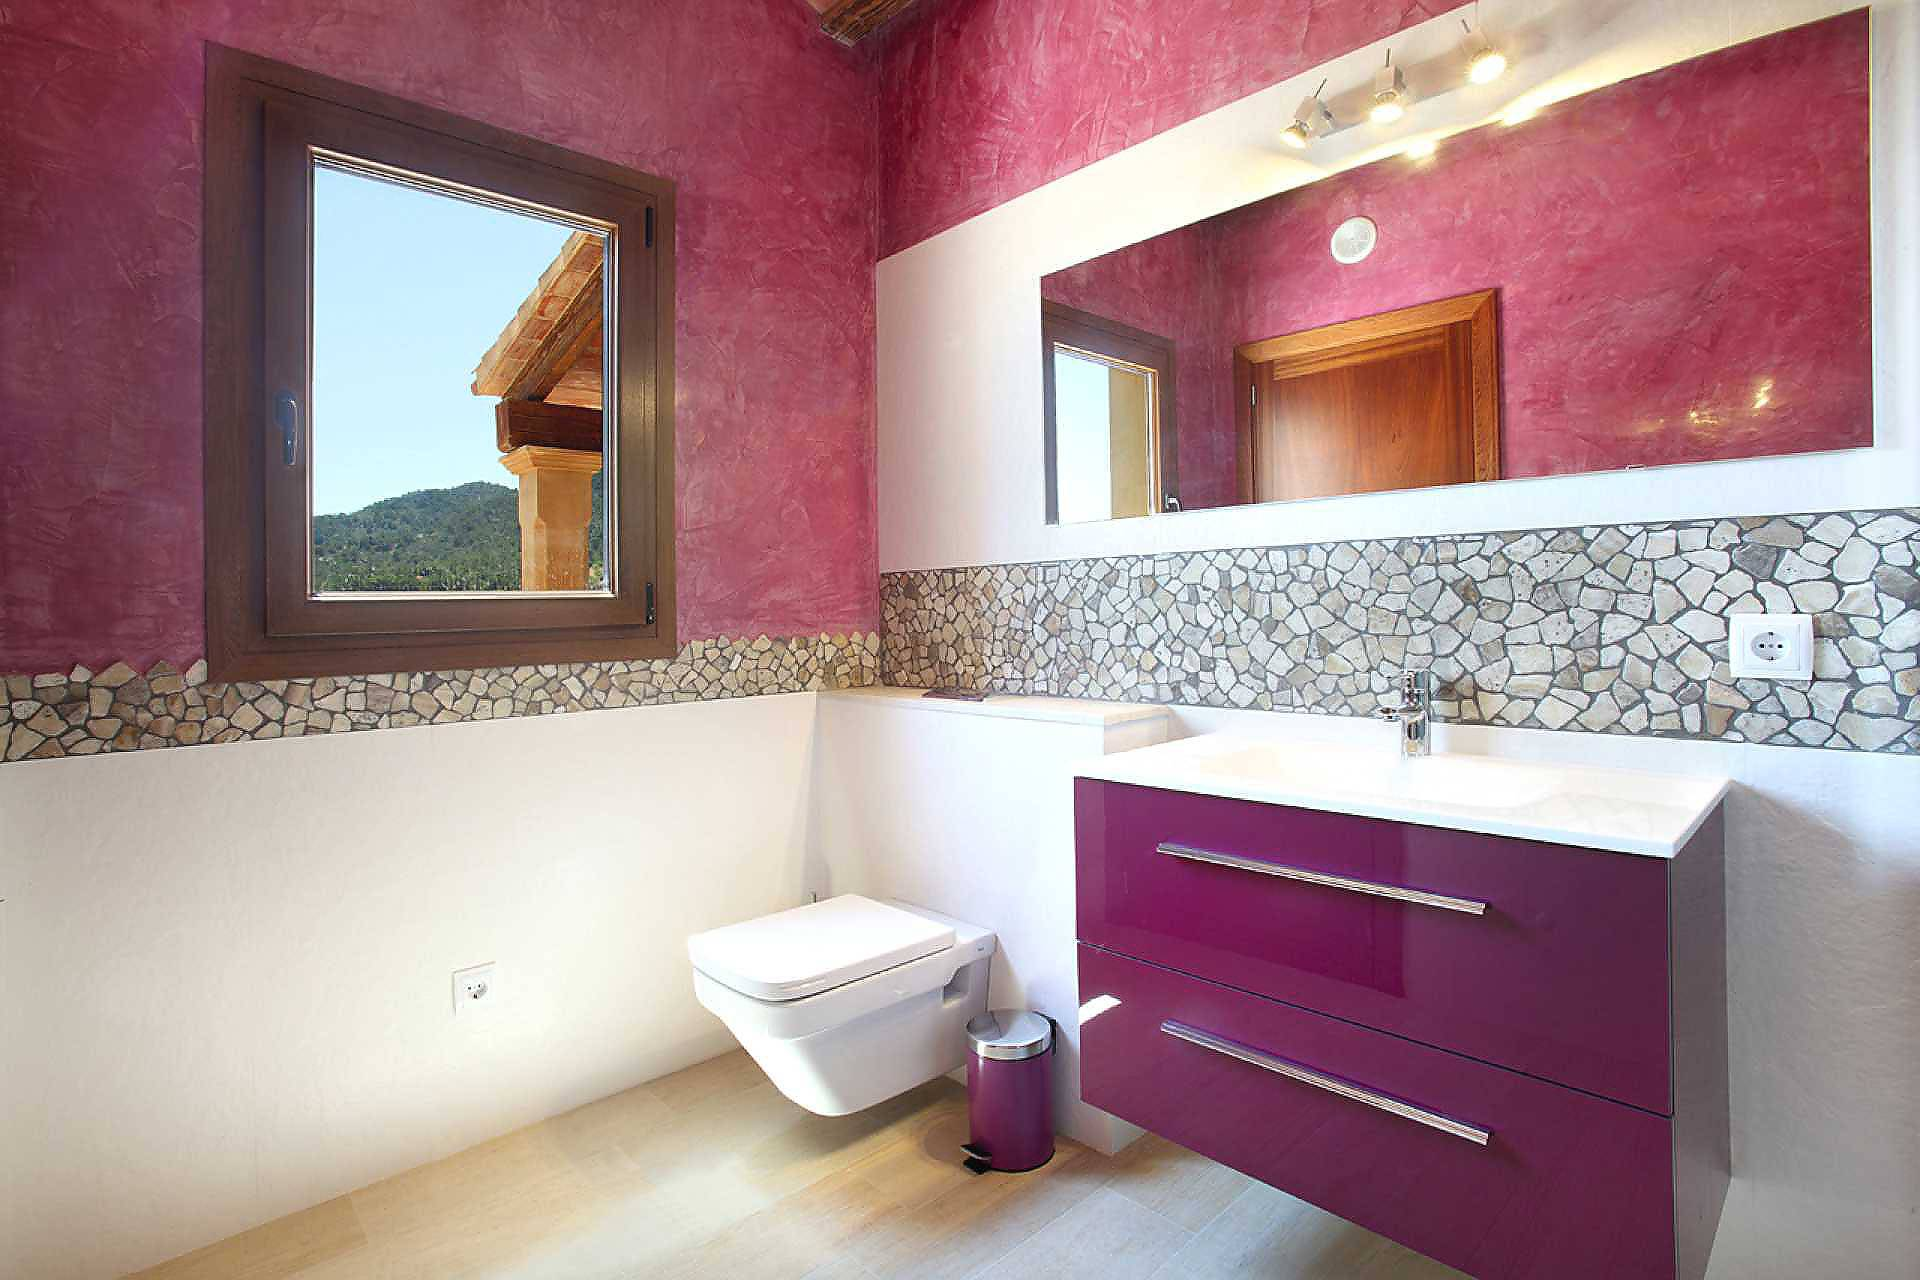 01-45 Exclusive Finca Mallorca East Bild 43